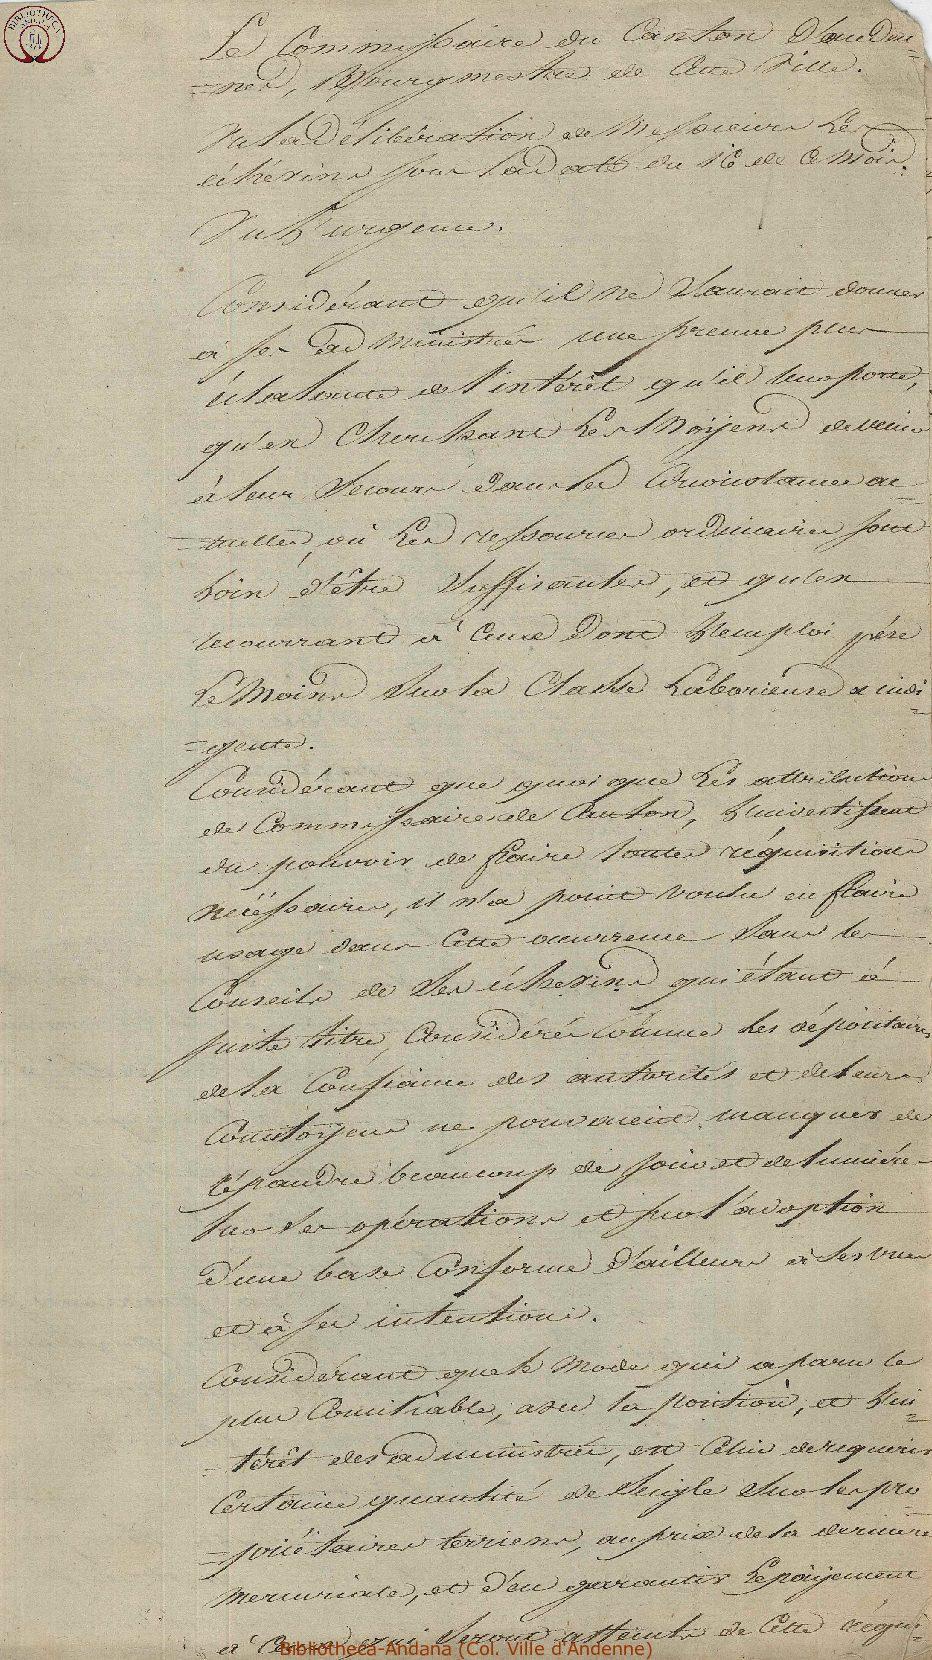 1815-05-17